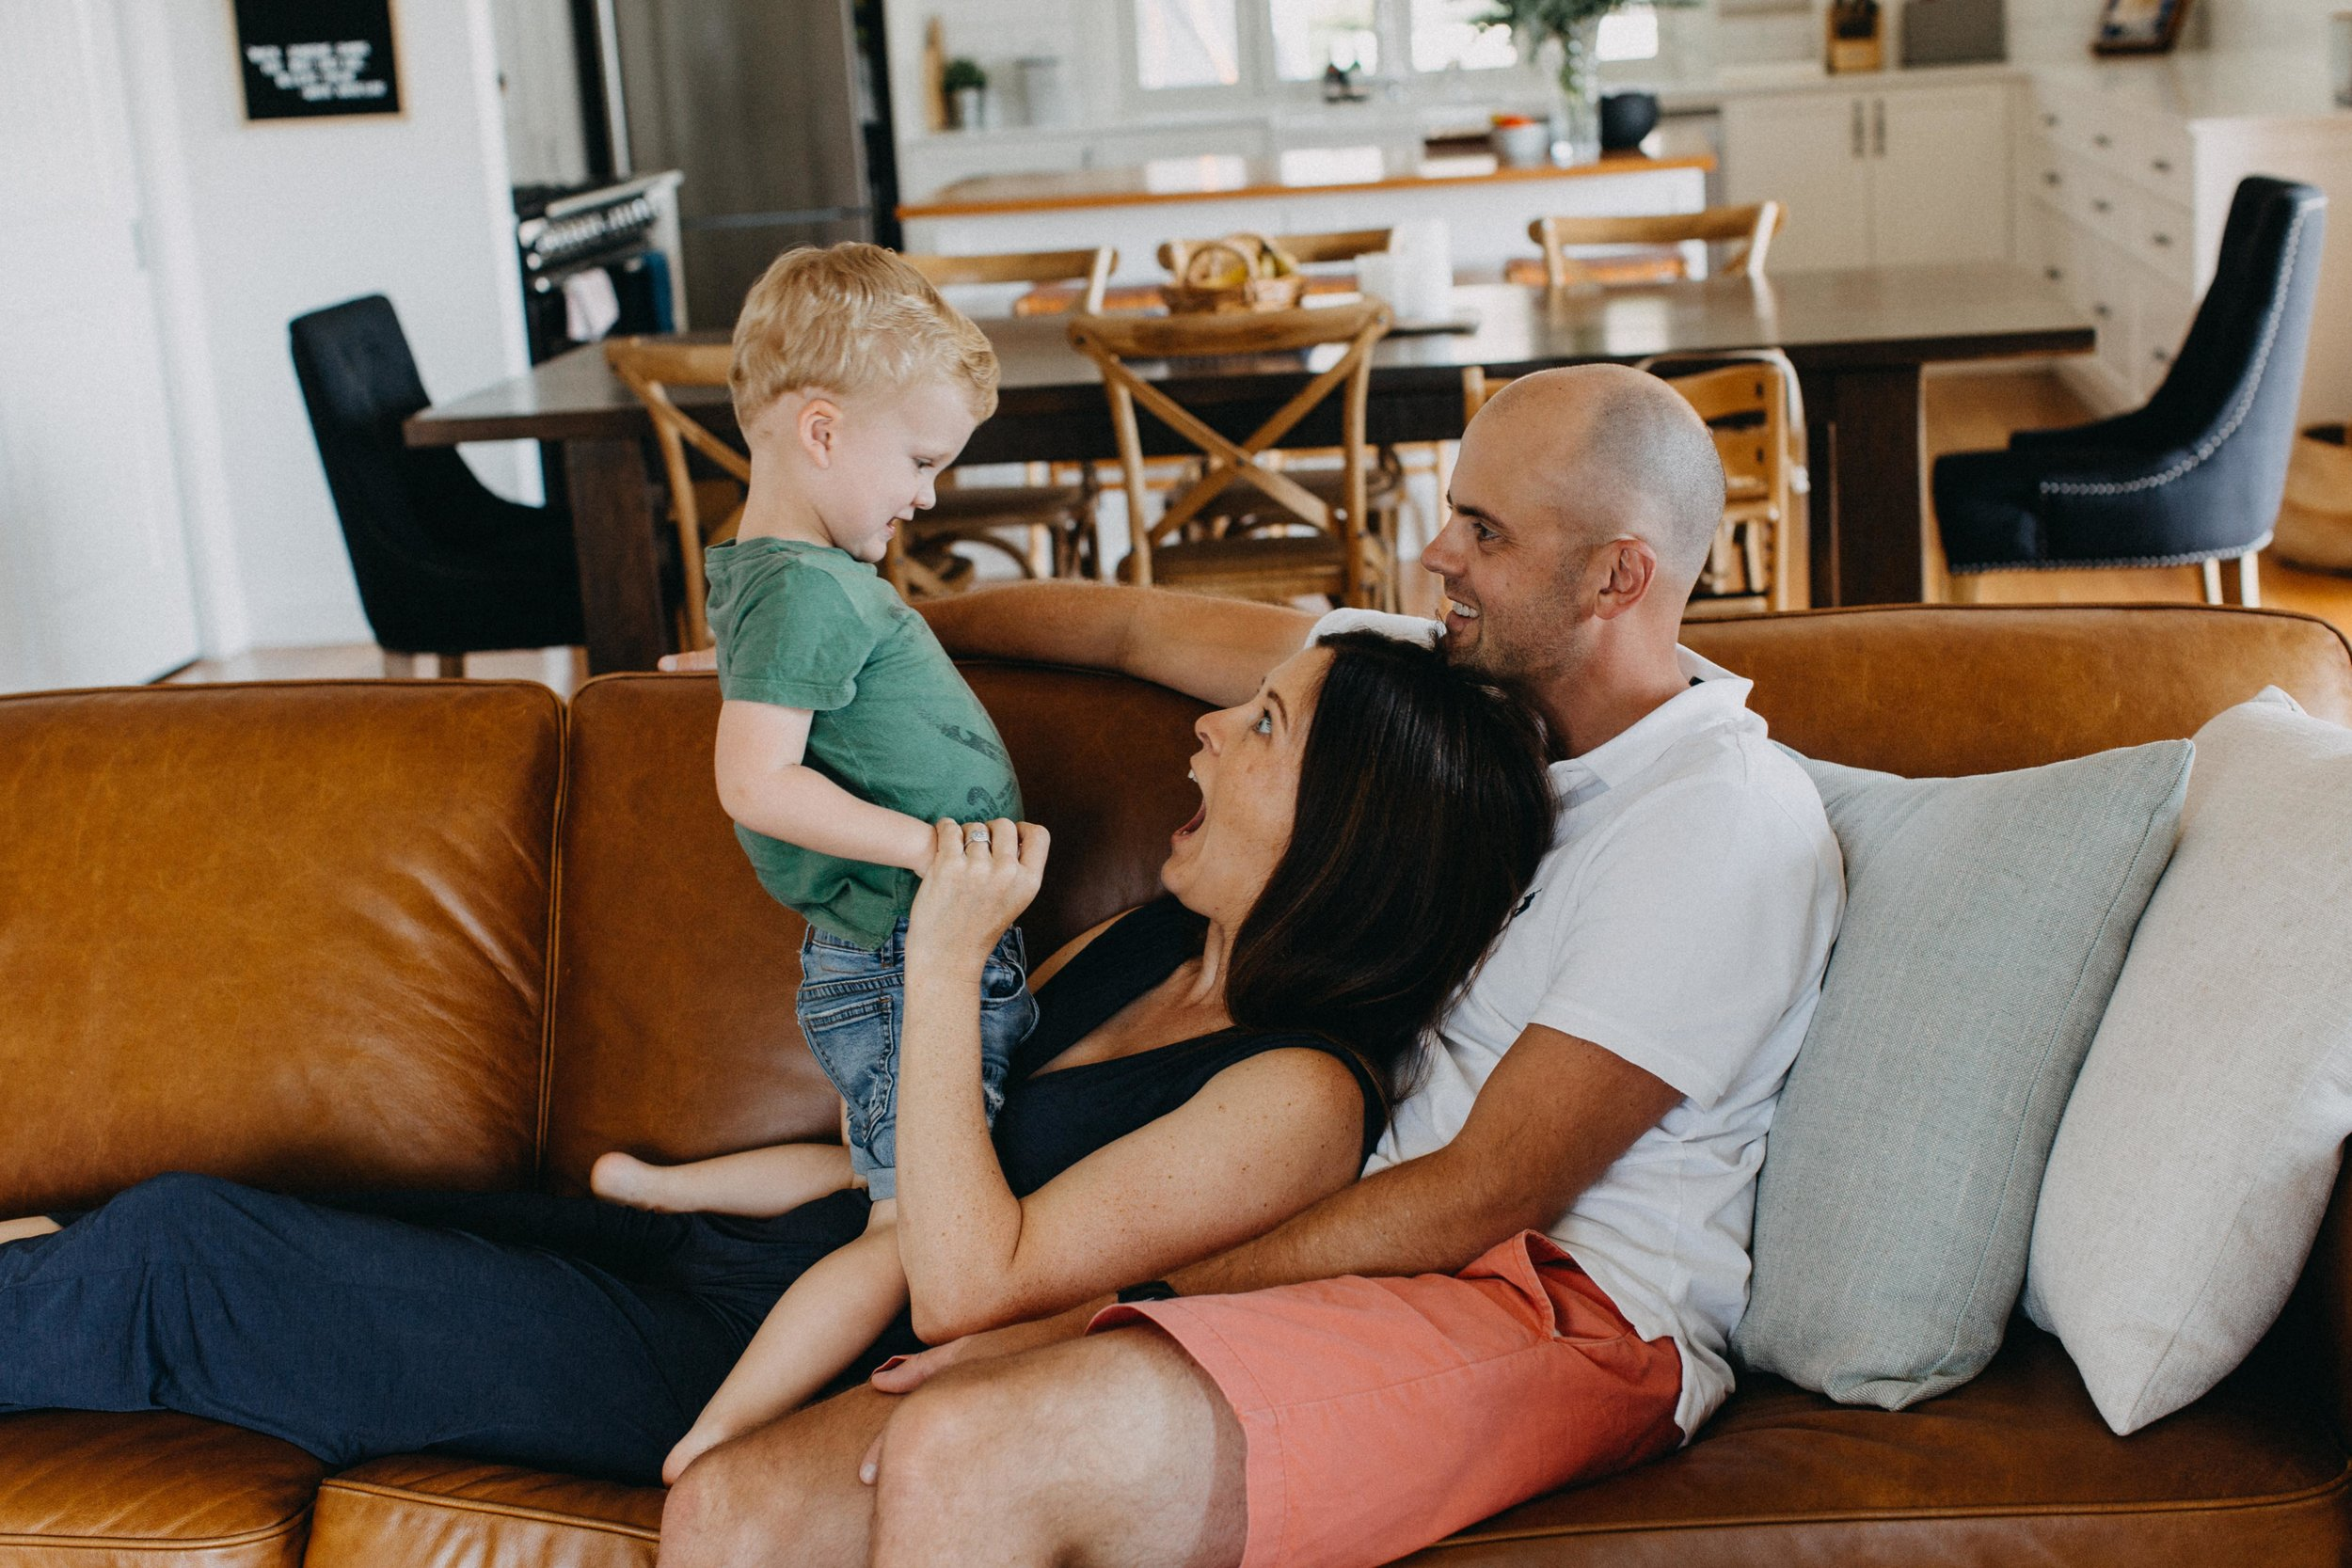 family-photography-picton-lifestyle-www.emilyobrienphotography.net-7.jpg